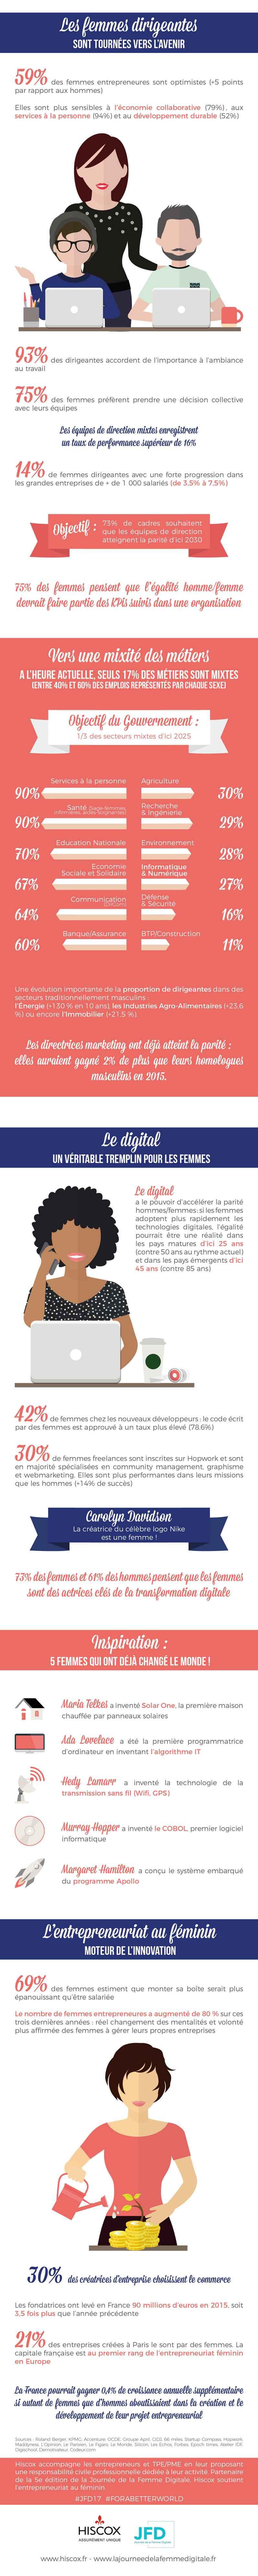 hiscox-infographie-femme-entrepreneur-jfd2017